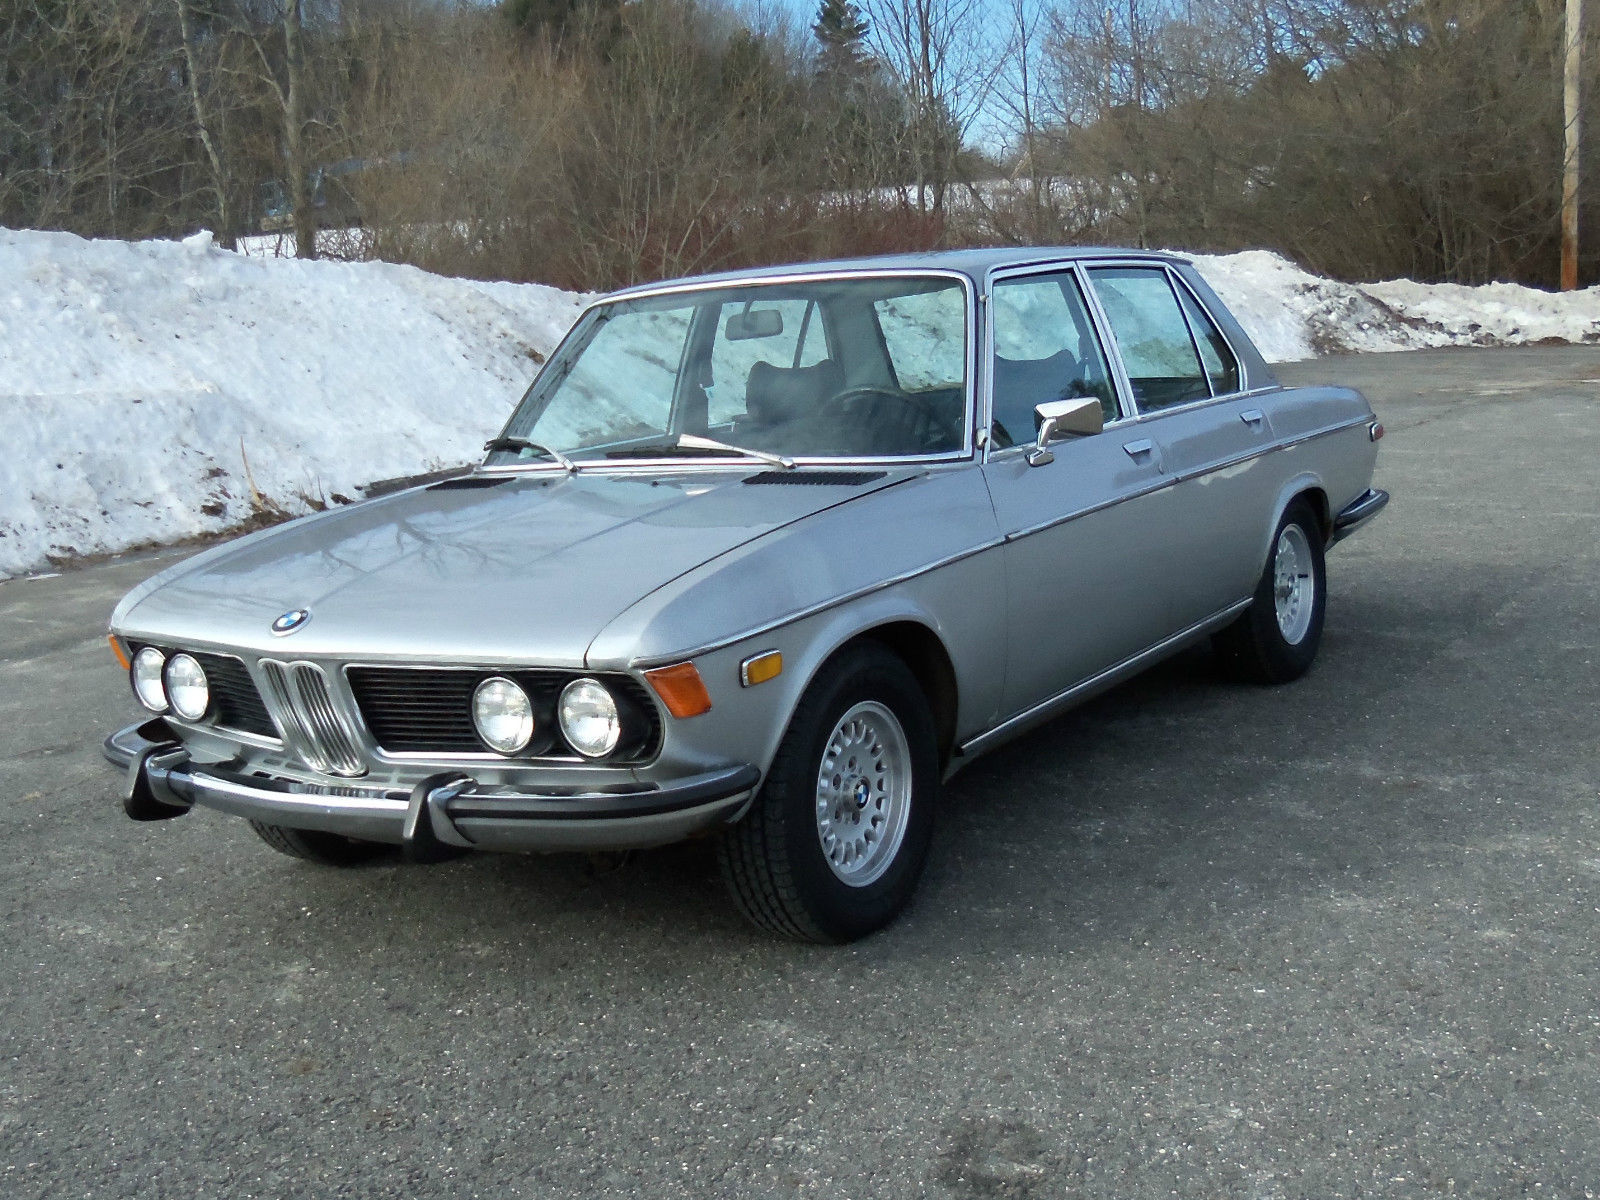 Transmission Fluid Color >> 1973 BMW 3.0 CS Bavaria - Classic BMW Other 1973 for sale